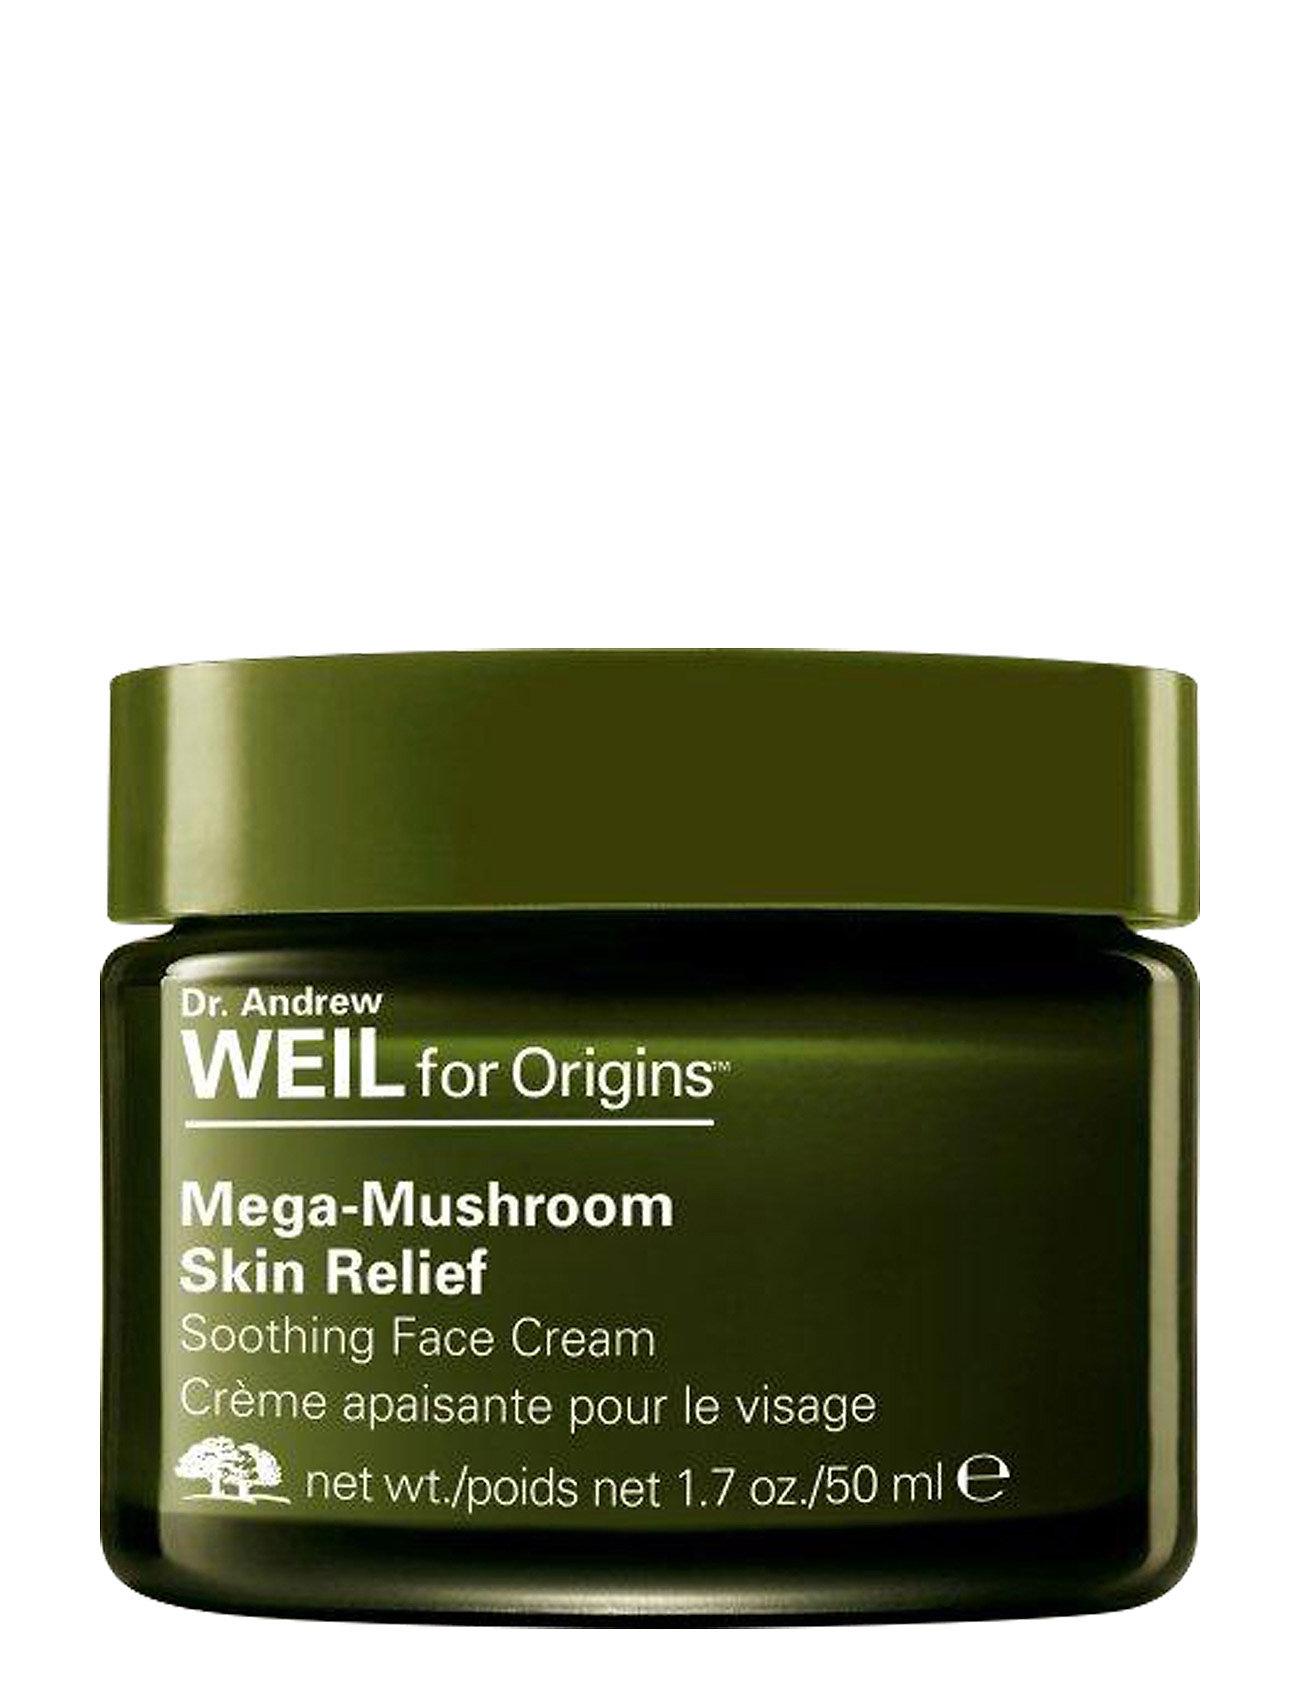 origins Dr. weil mega-mushroom skin relief soothing face cream på boozt.com dk